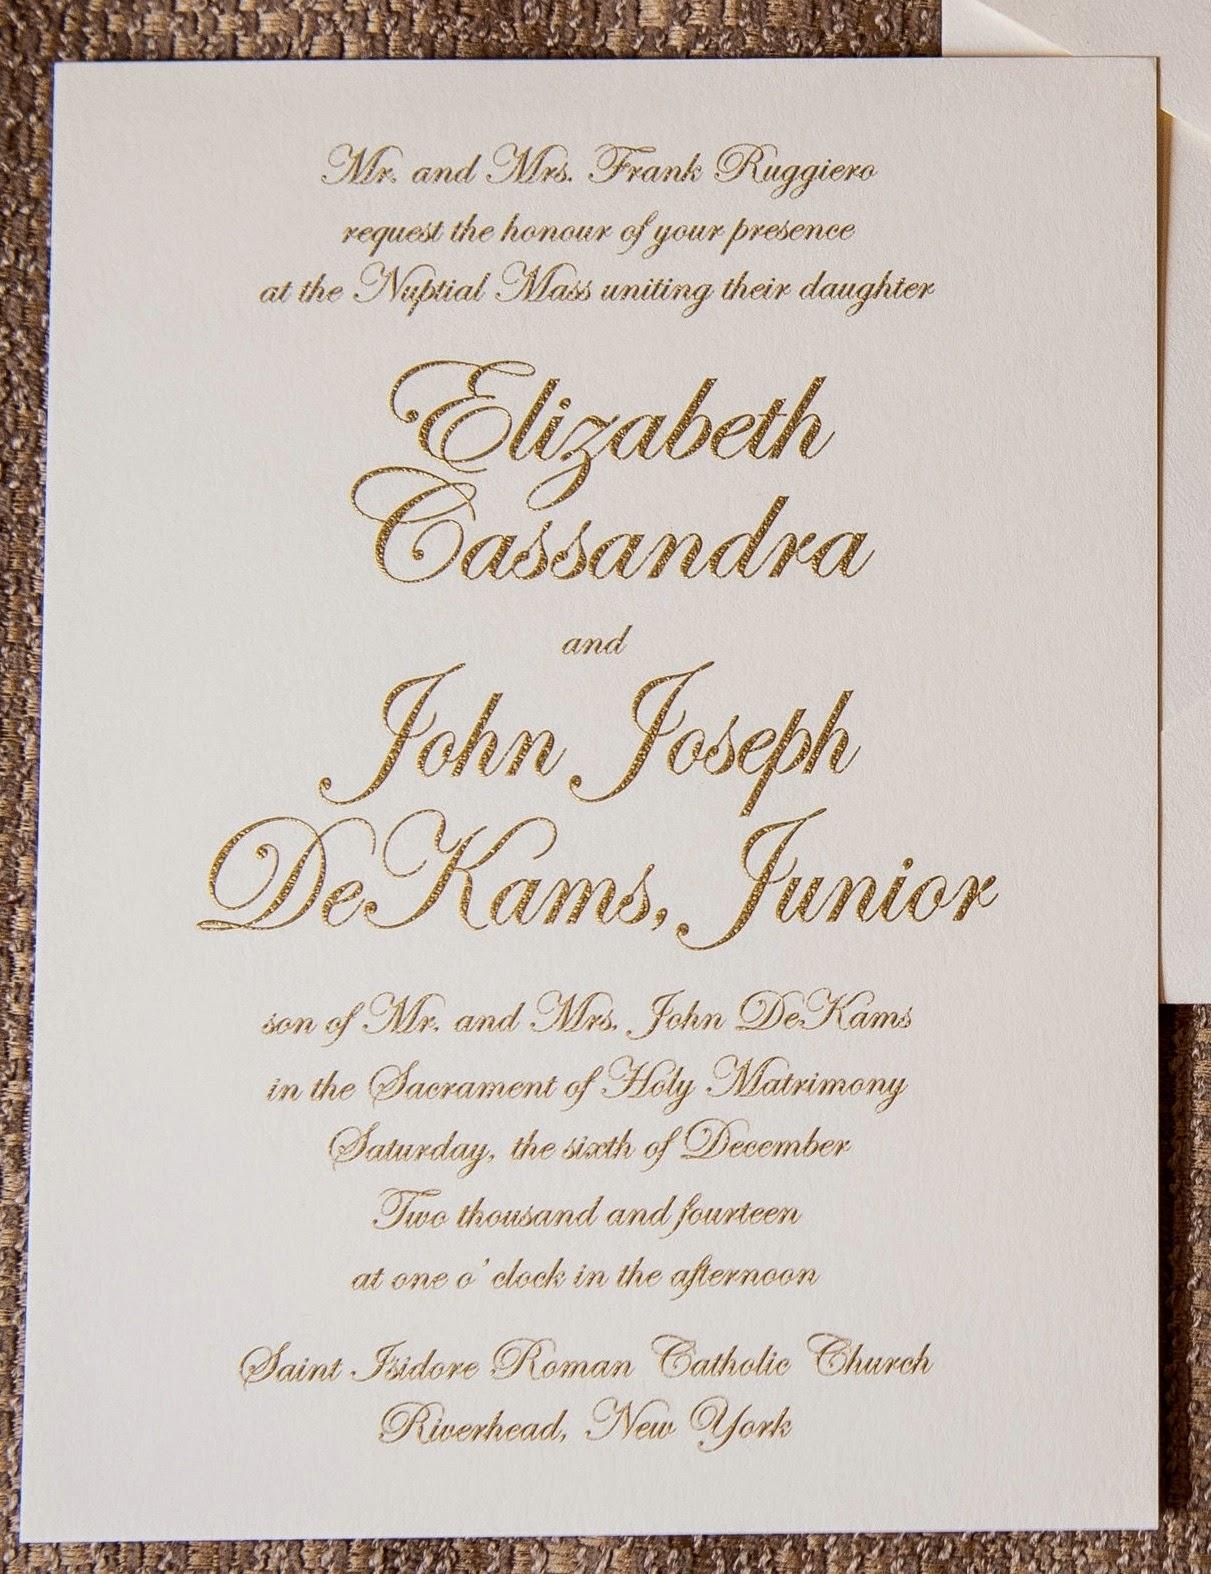 Wedding Invitation Wording For Catholic Mass Yaseen for